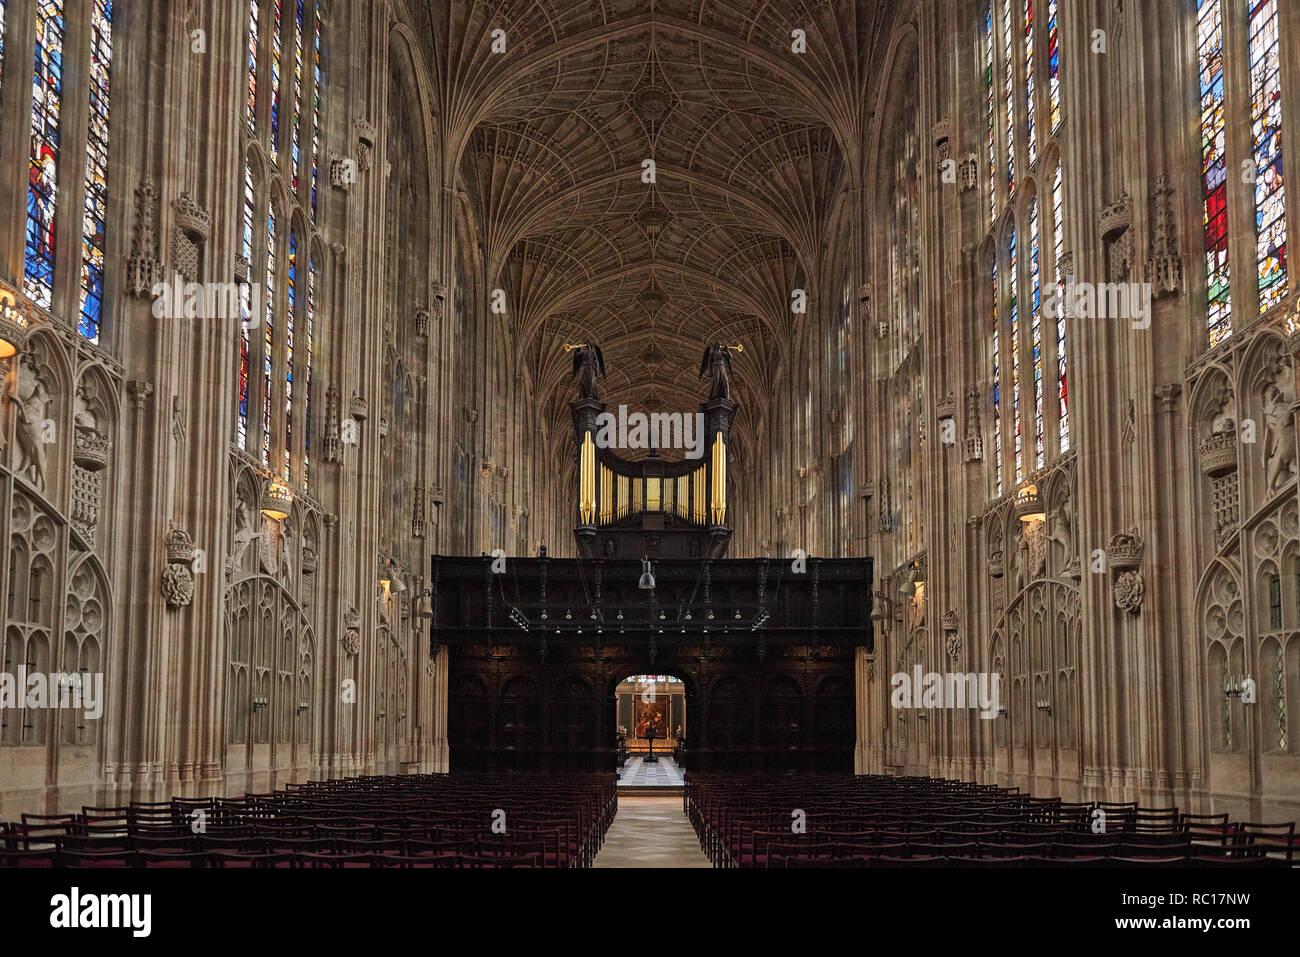 King's college chapel interior at King's college Cambridge University Stock Photo